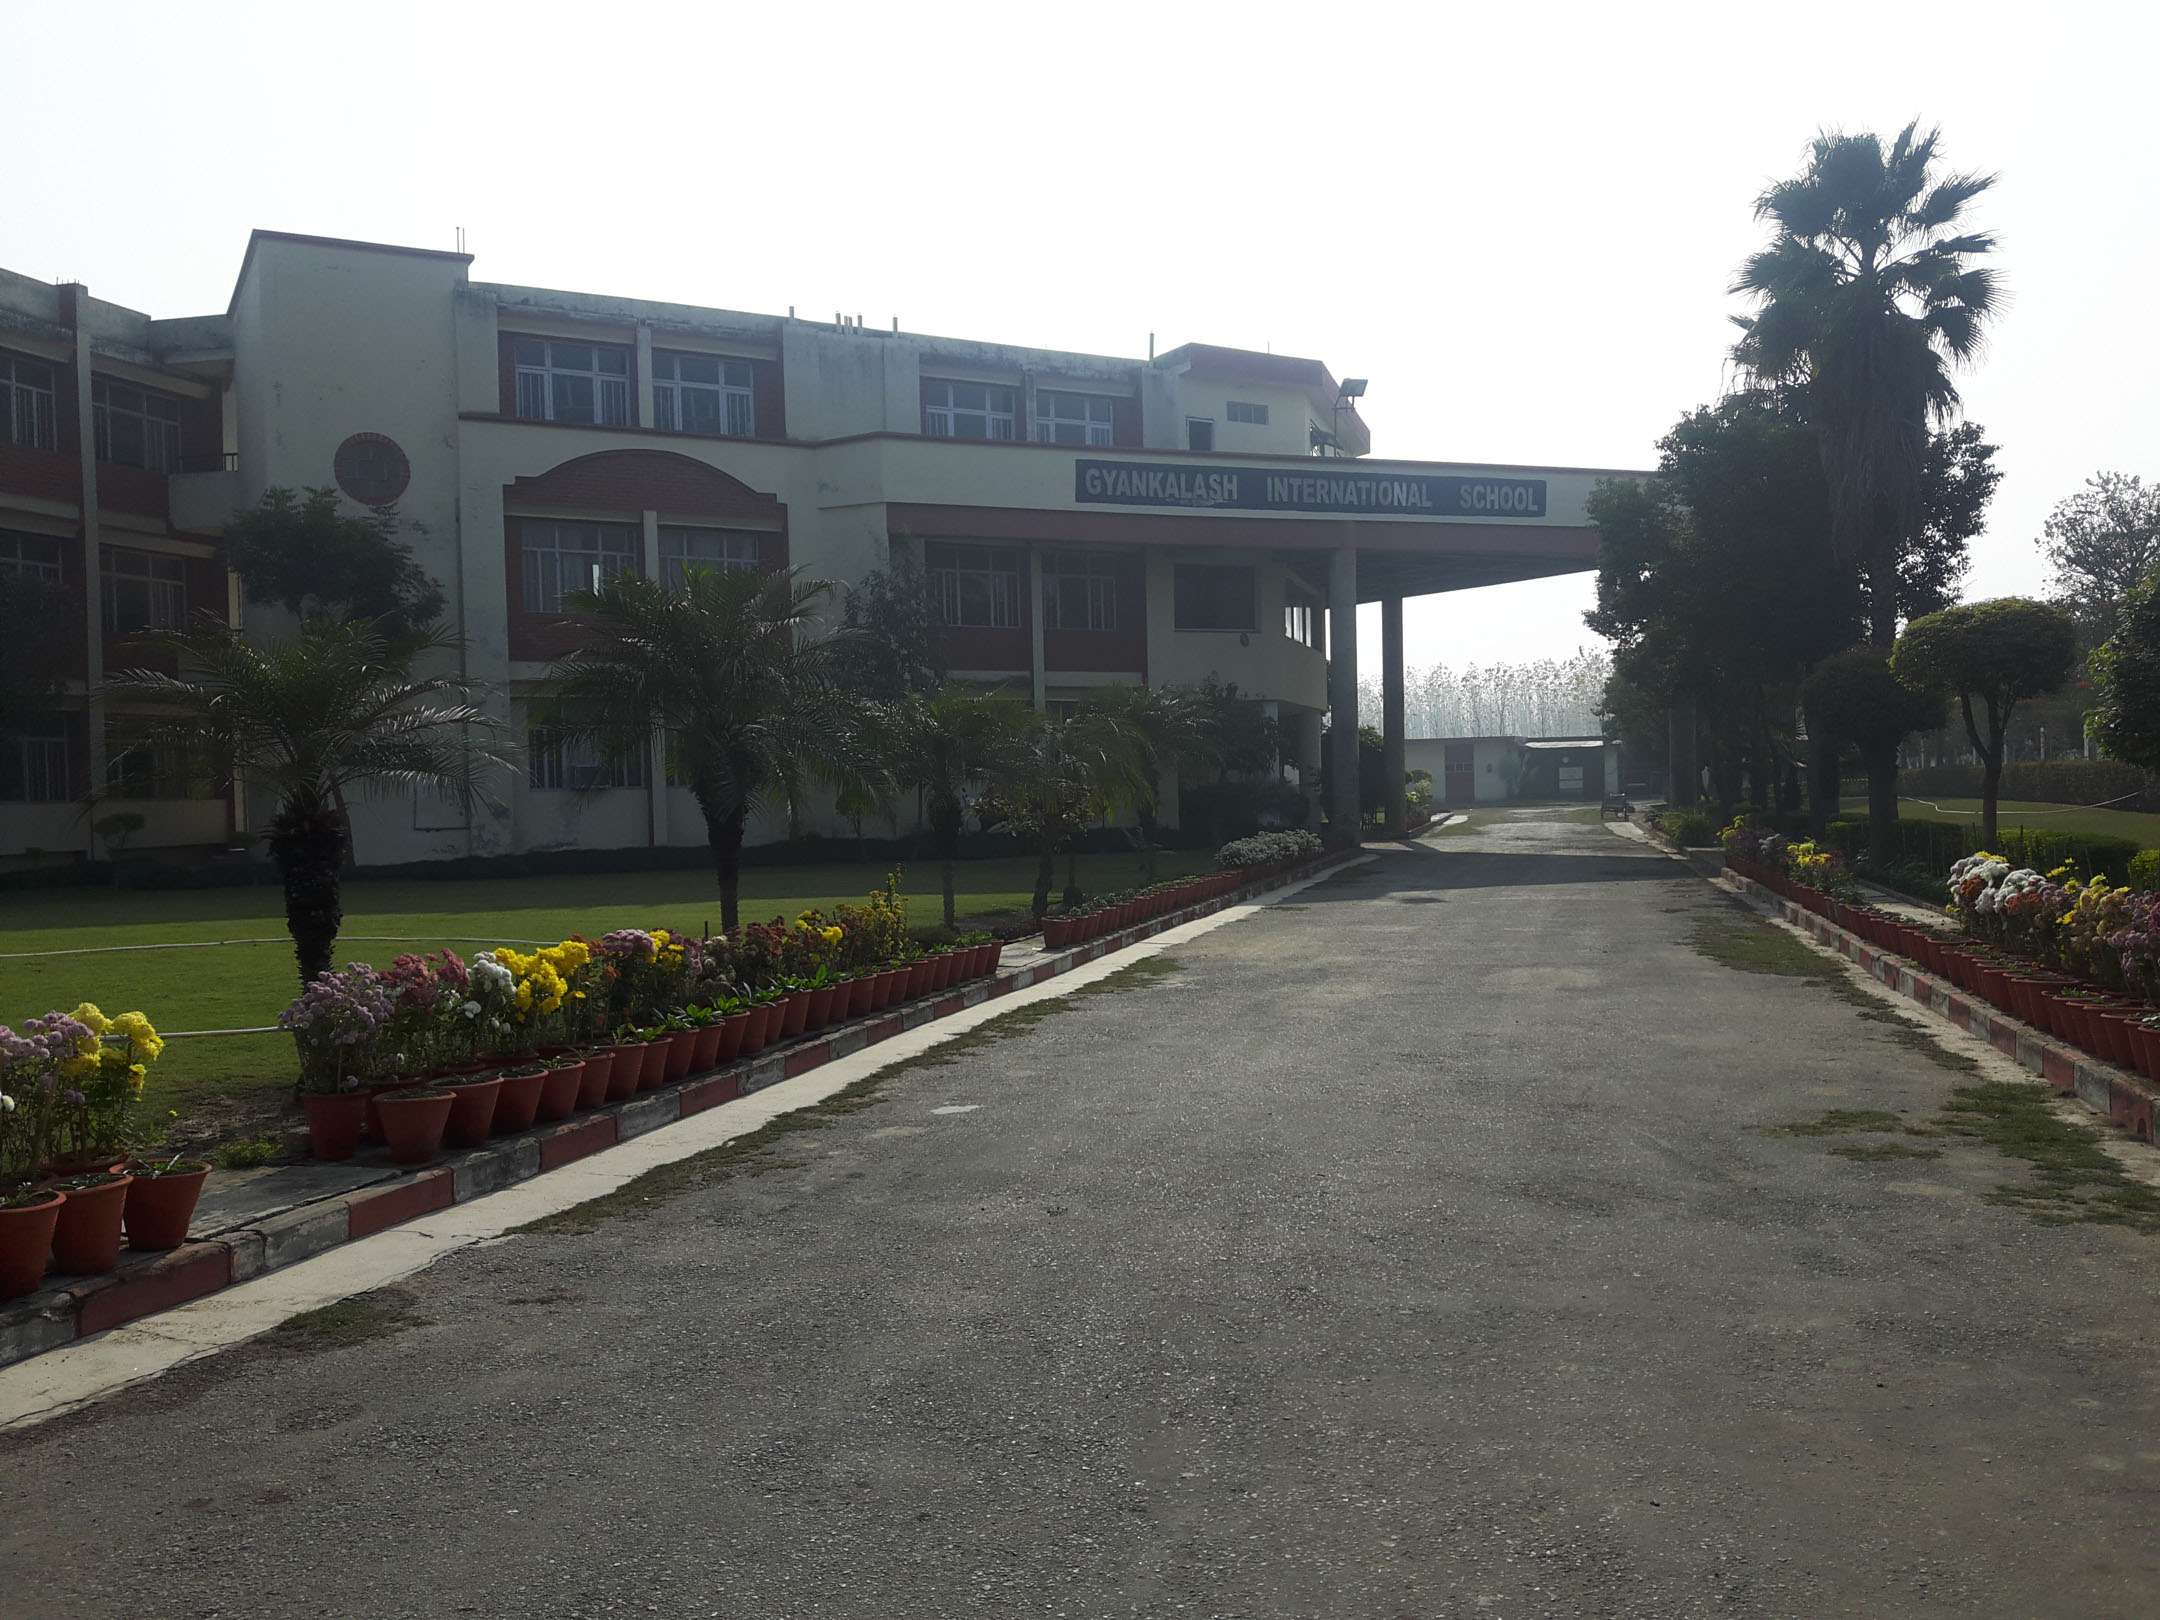 GYAN KALASH INTERNATIONAL SCHOOL NEAR P amp T TRAINING CENTRE AMBALA ROAD SAHARANPUR U P 2130824